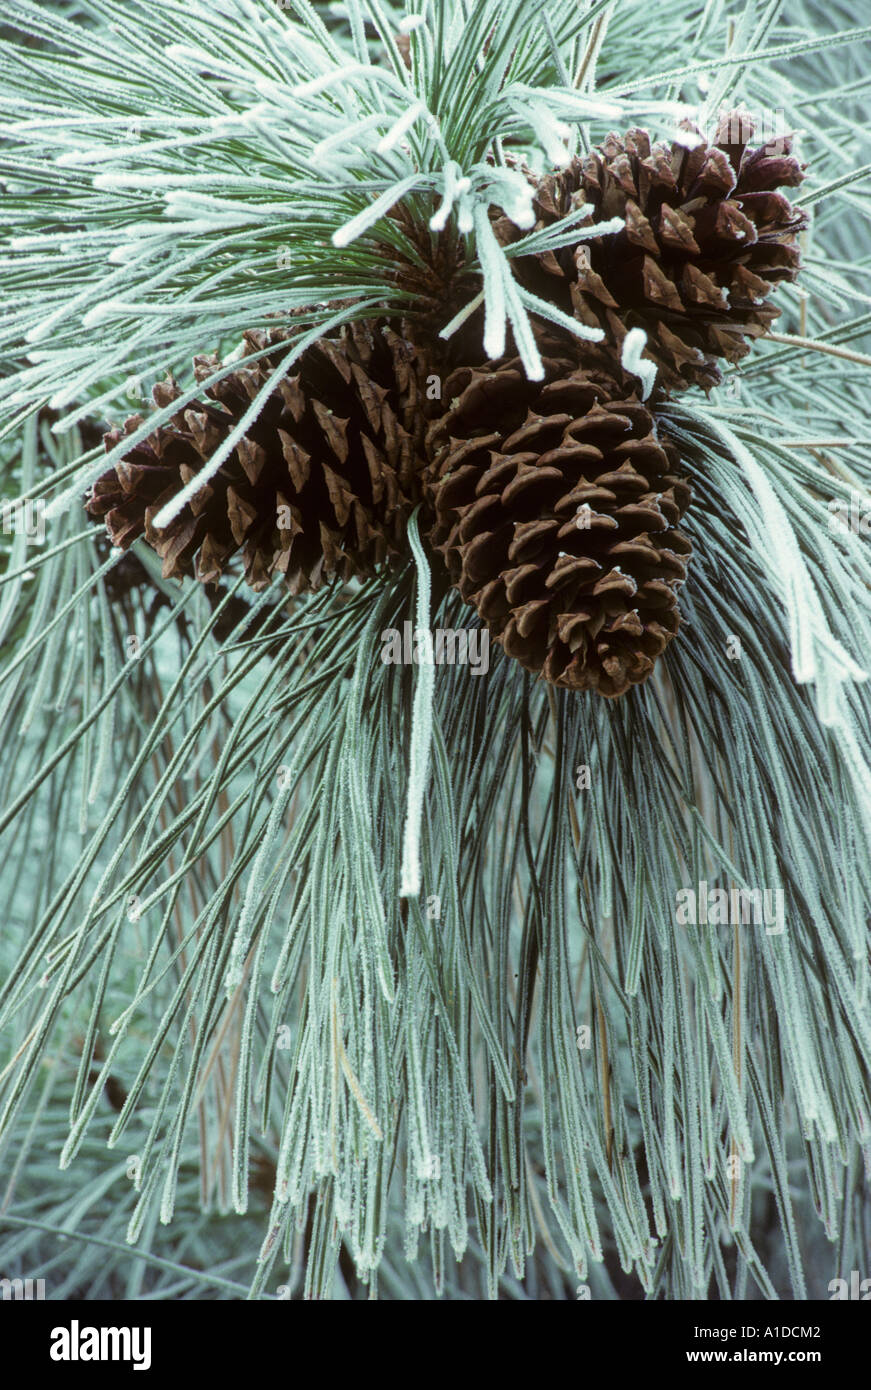 Bereift, Kiefernnadel und Kegel Gelb-Kiefer, Pinus ponderosa Stockbild